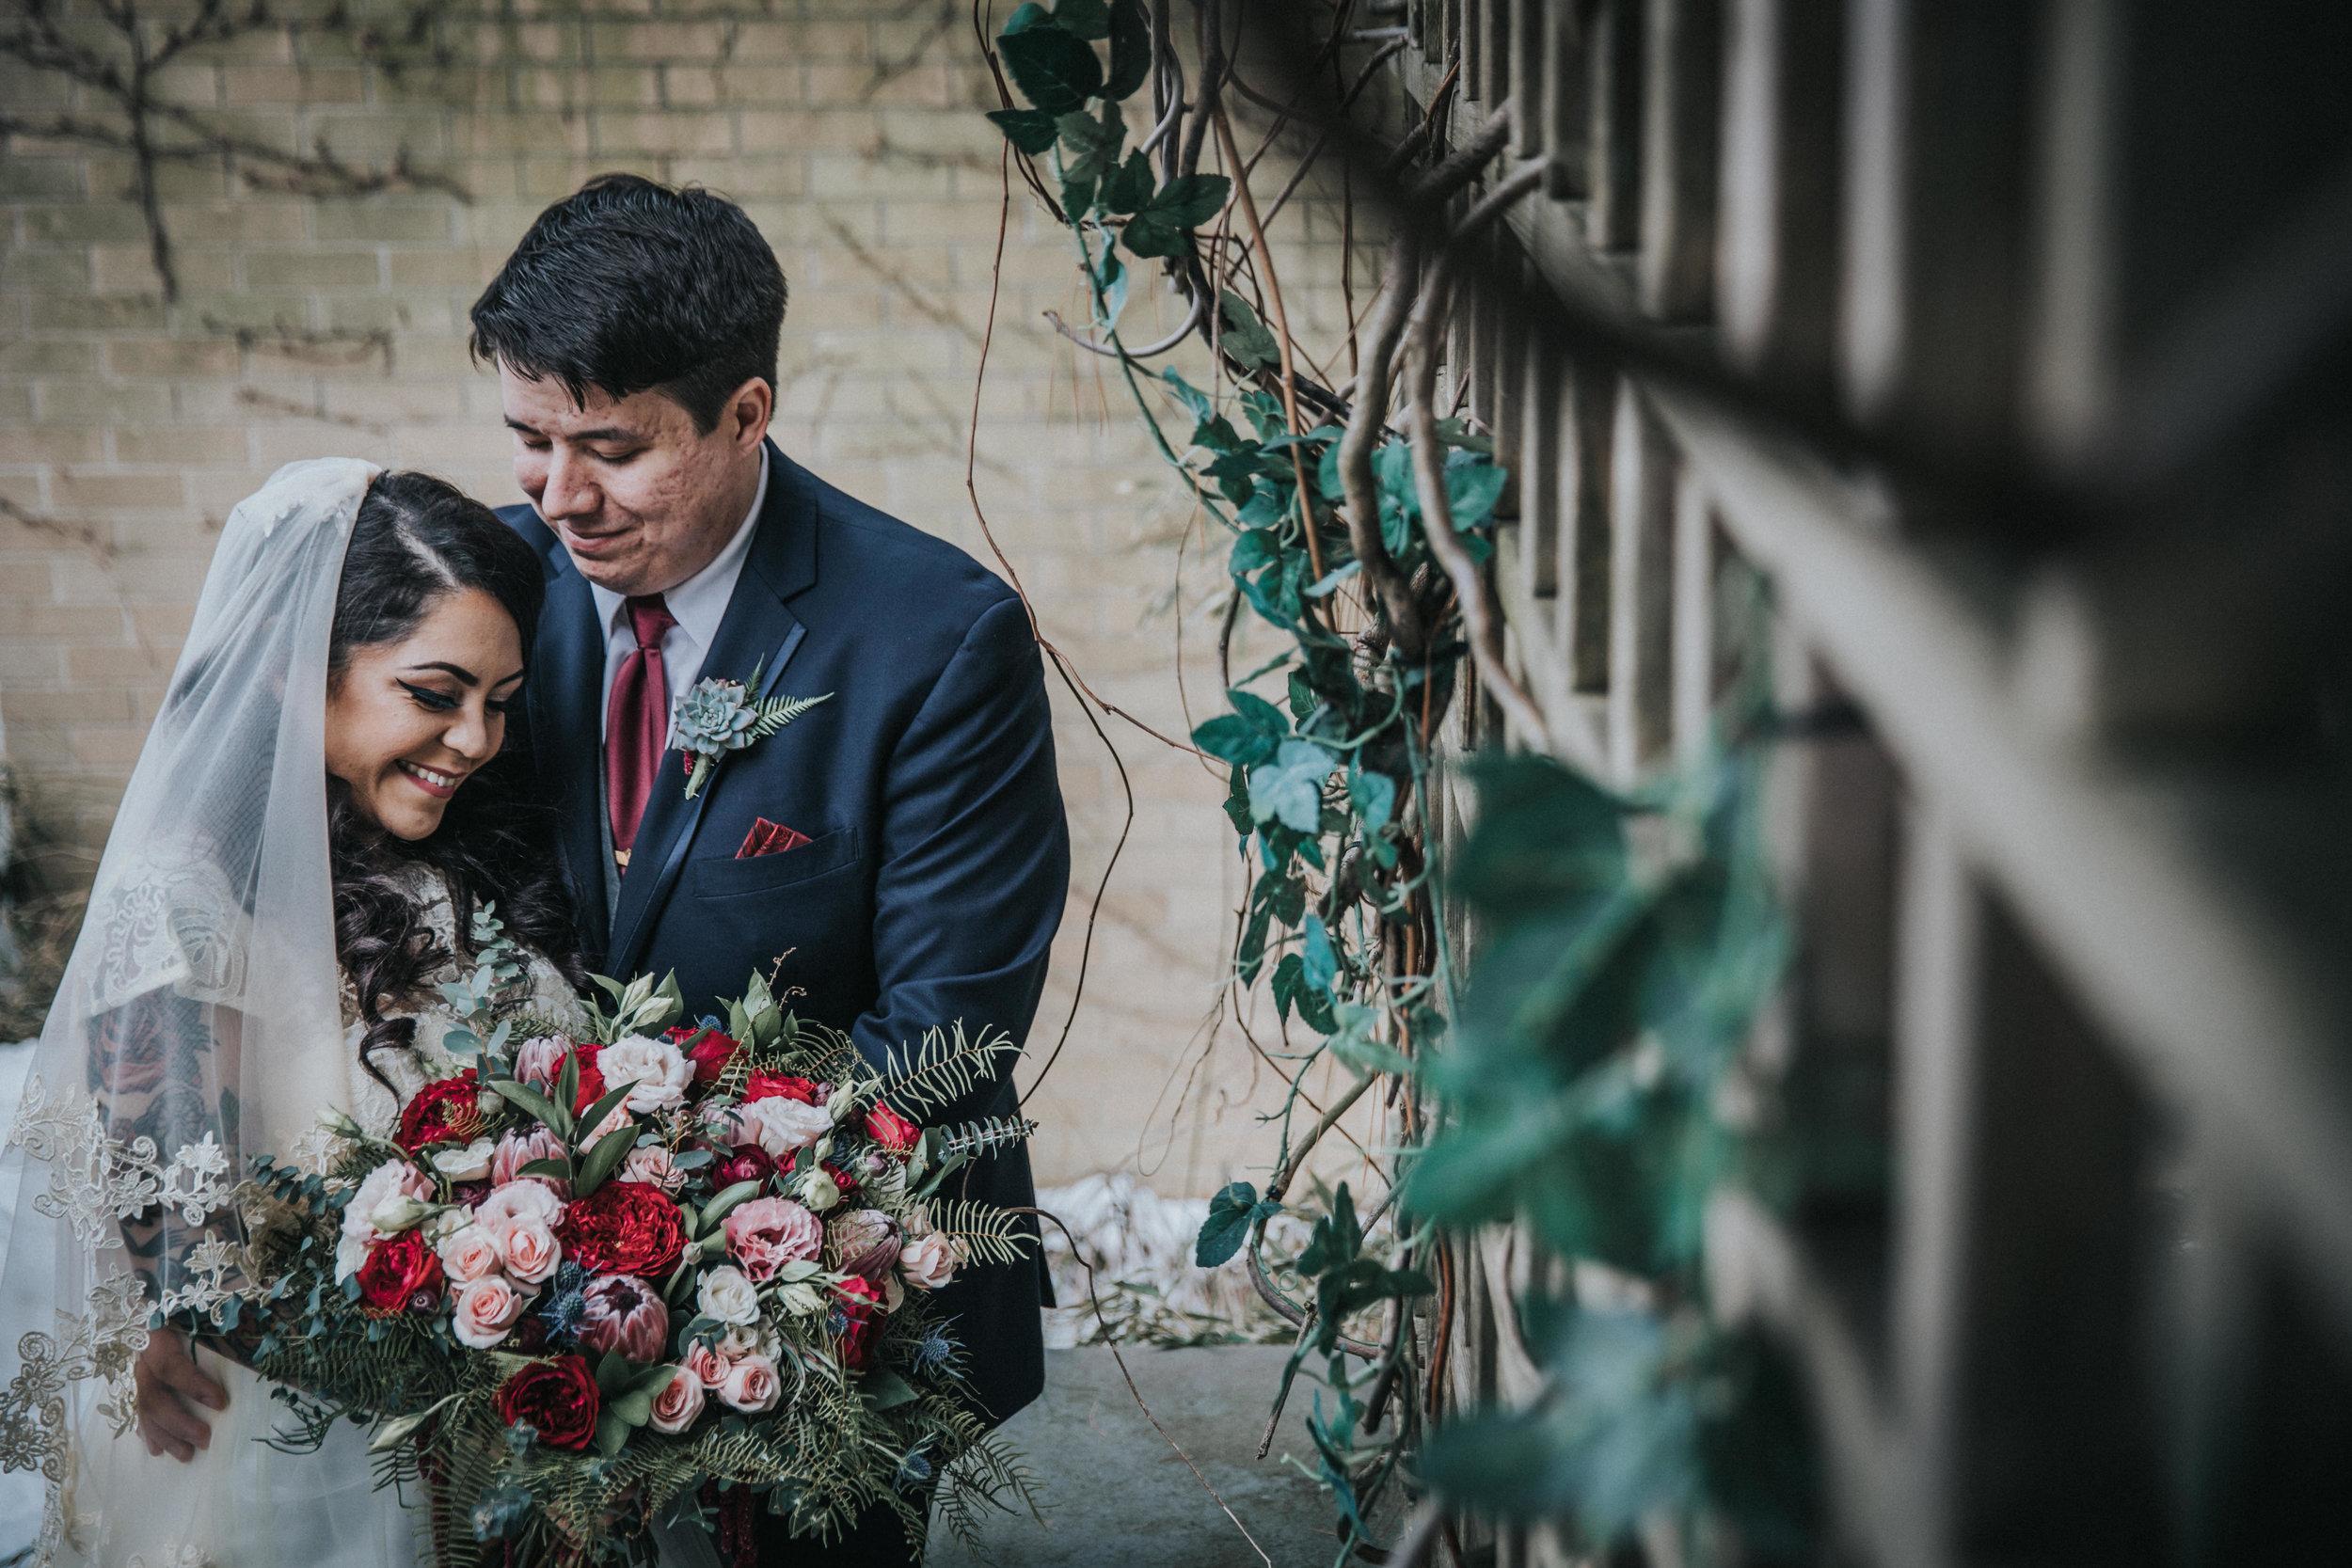 New-Jersey-Wedding-Photographer-ReceptionCenter-Valeria&Mike-First-Look-Bride&Groom (67 of 69).jpg